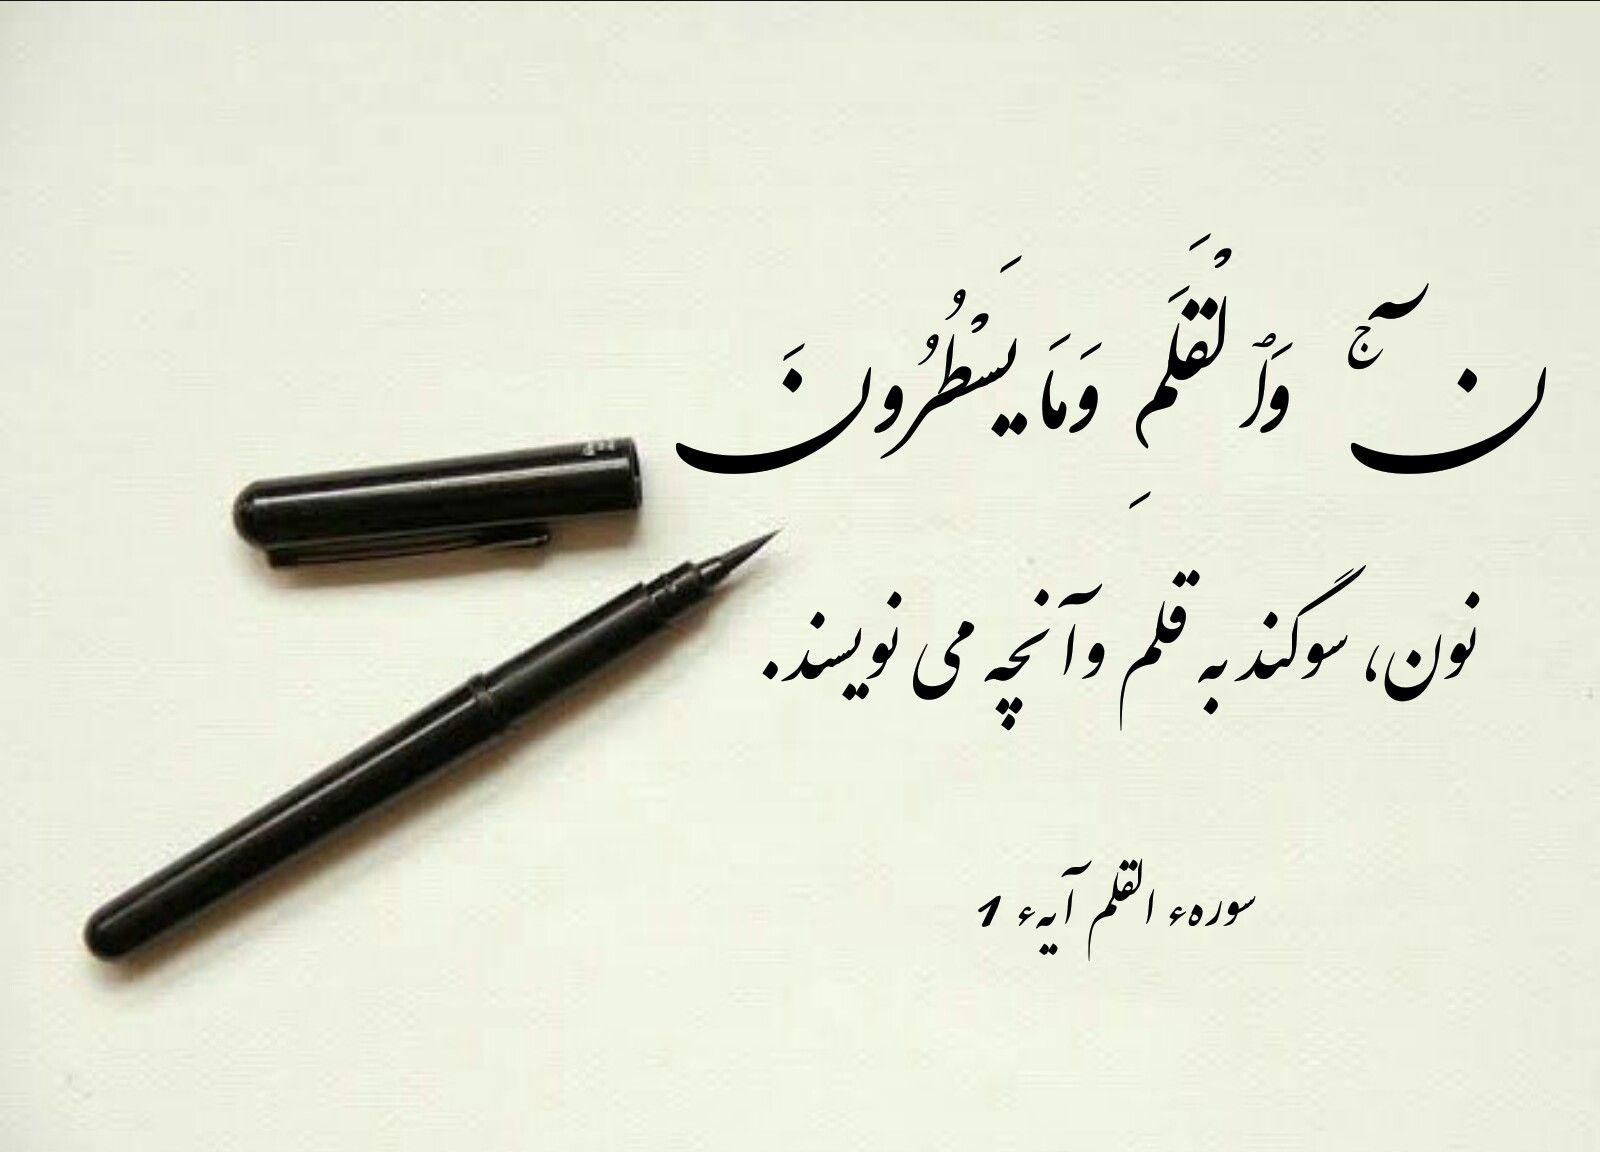 Pin by Mastoora👑 on دینم زیباست Calligraphy, Arabic